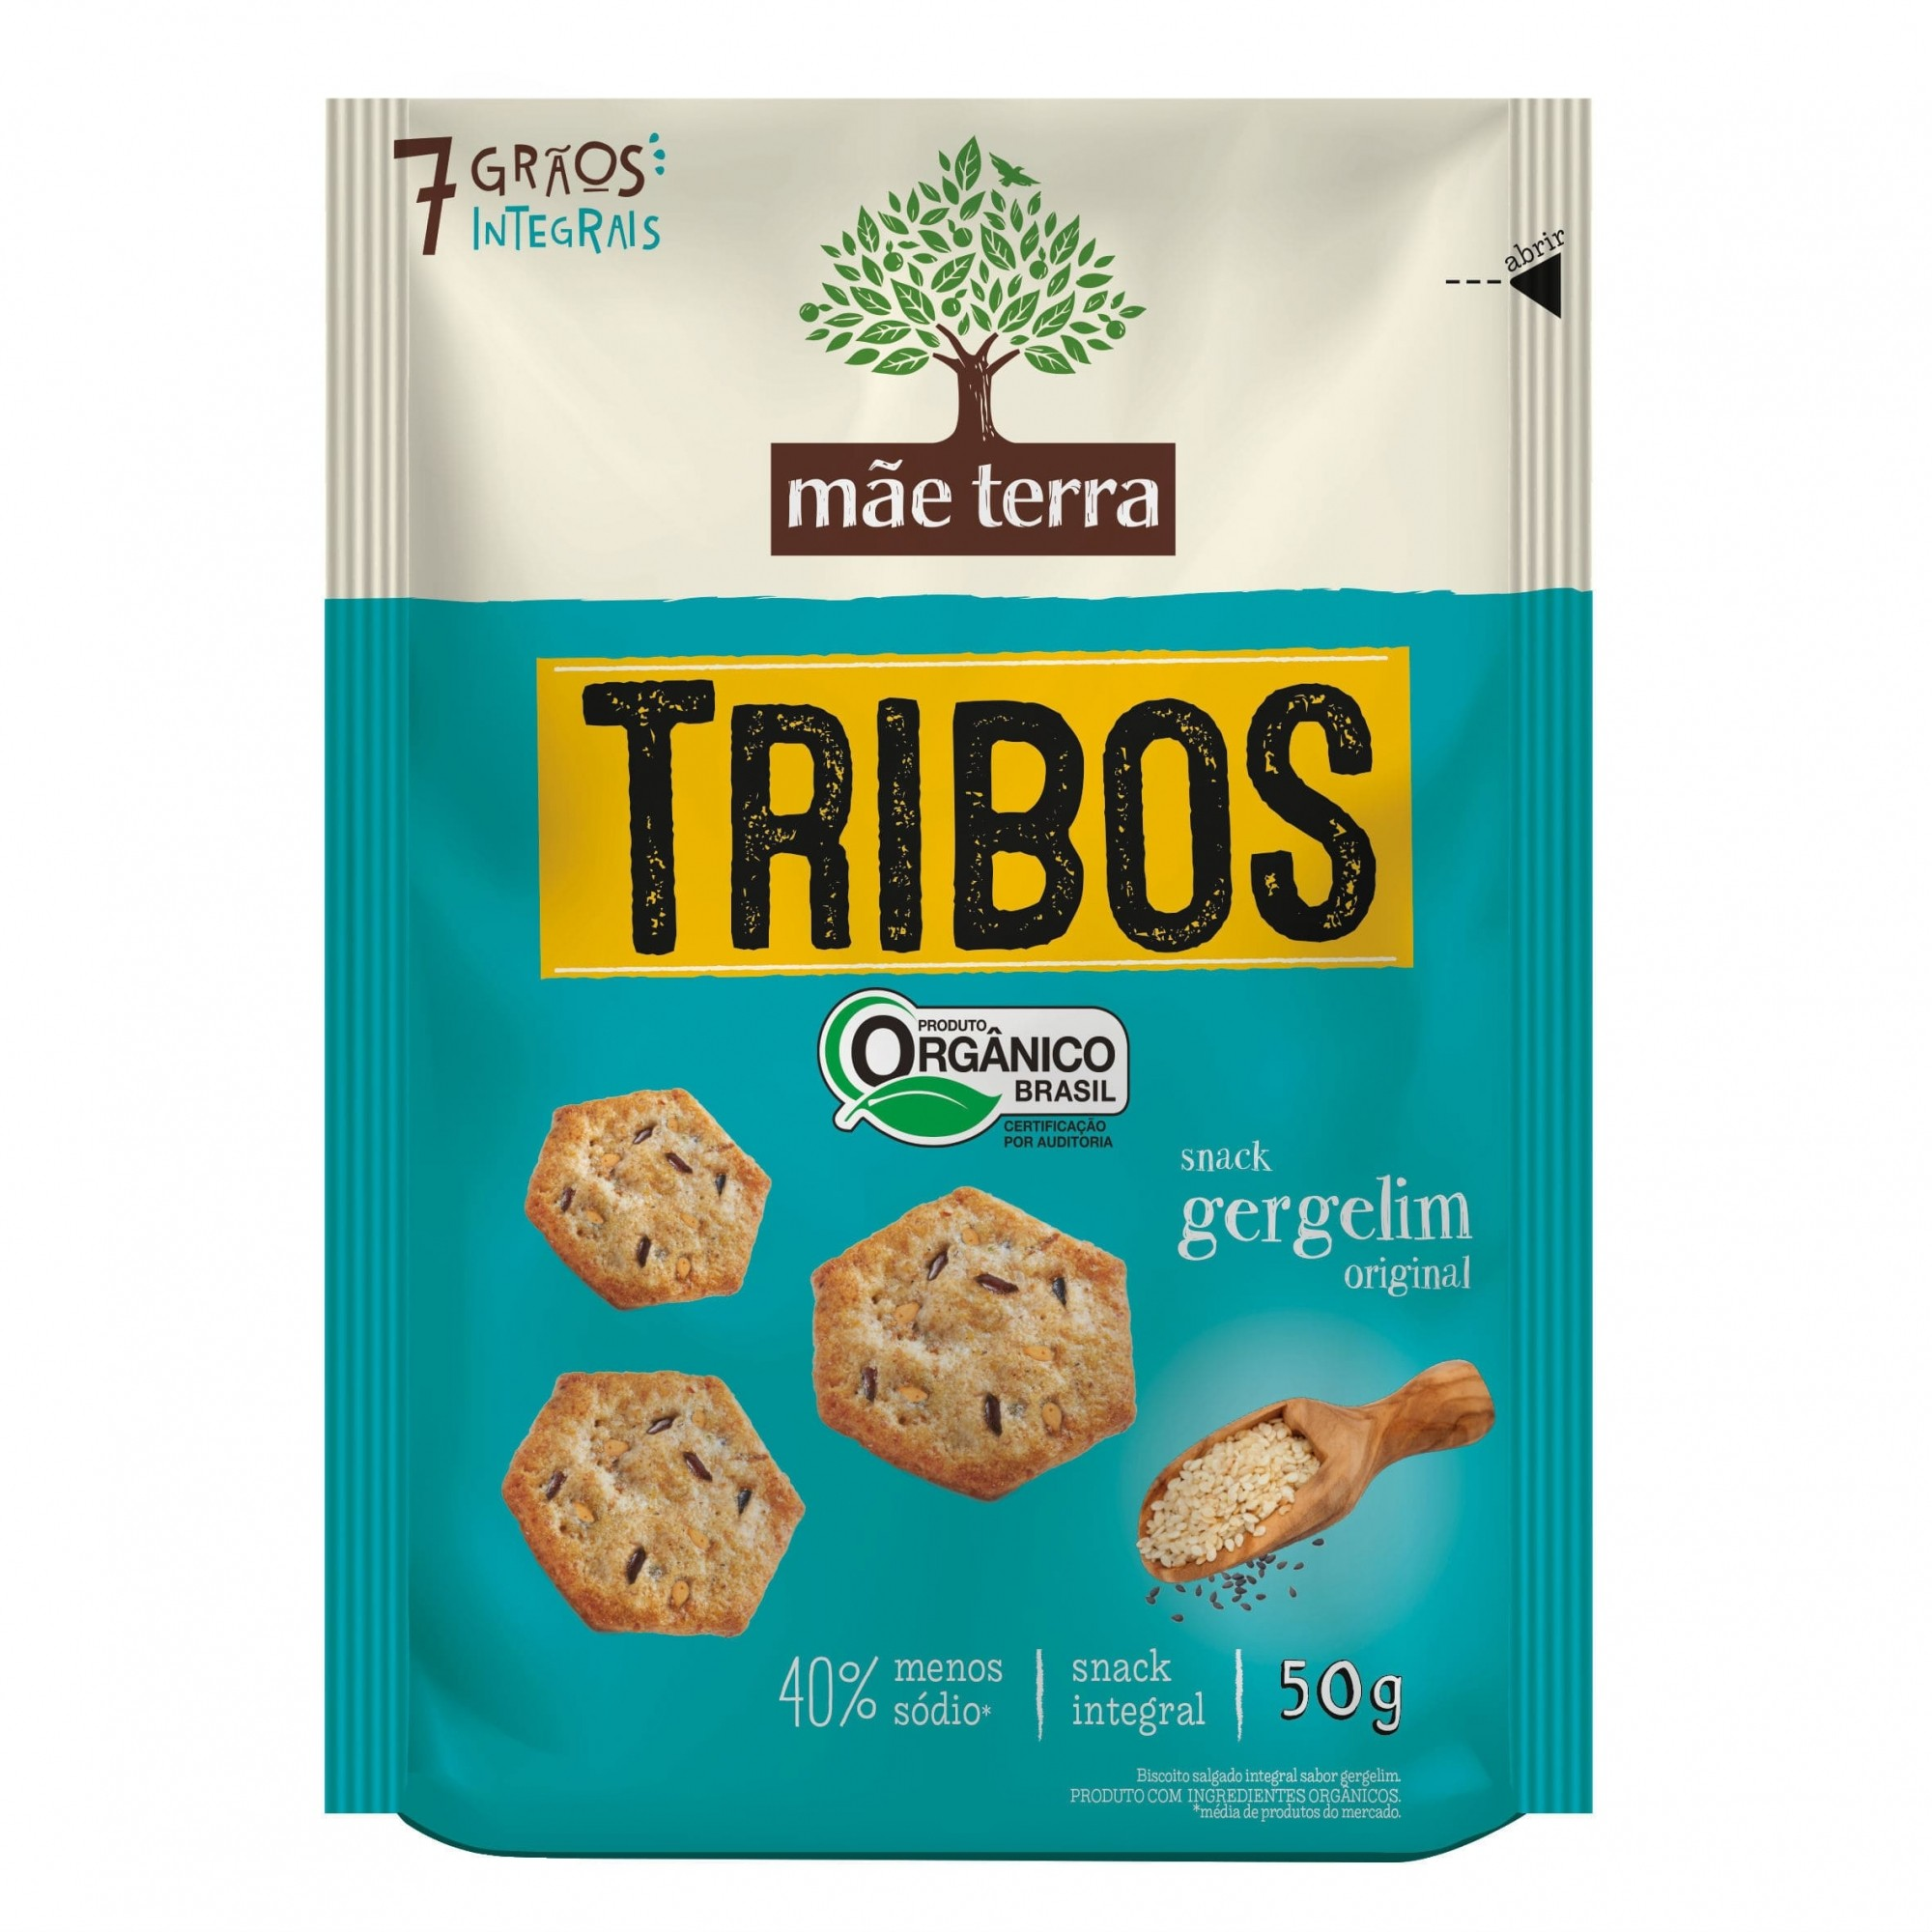 Tribos Snack Orgânico Gergelim Original 50g - Mãe Terra